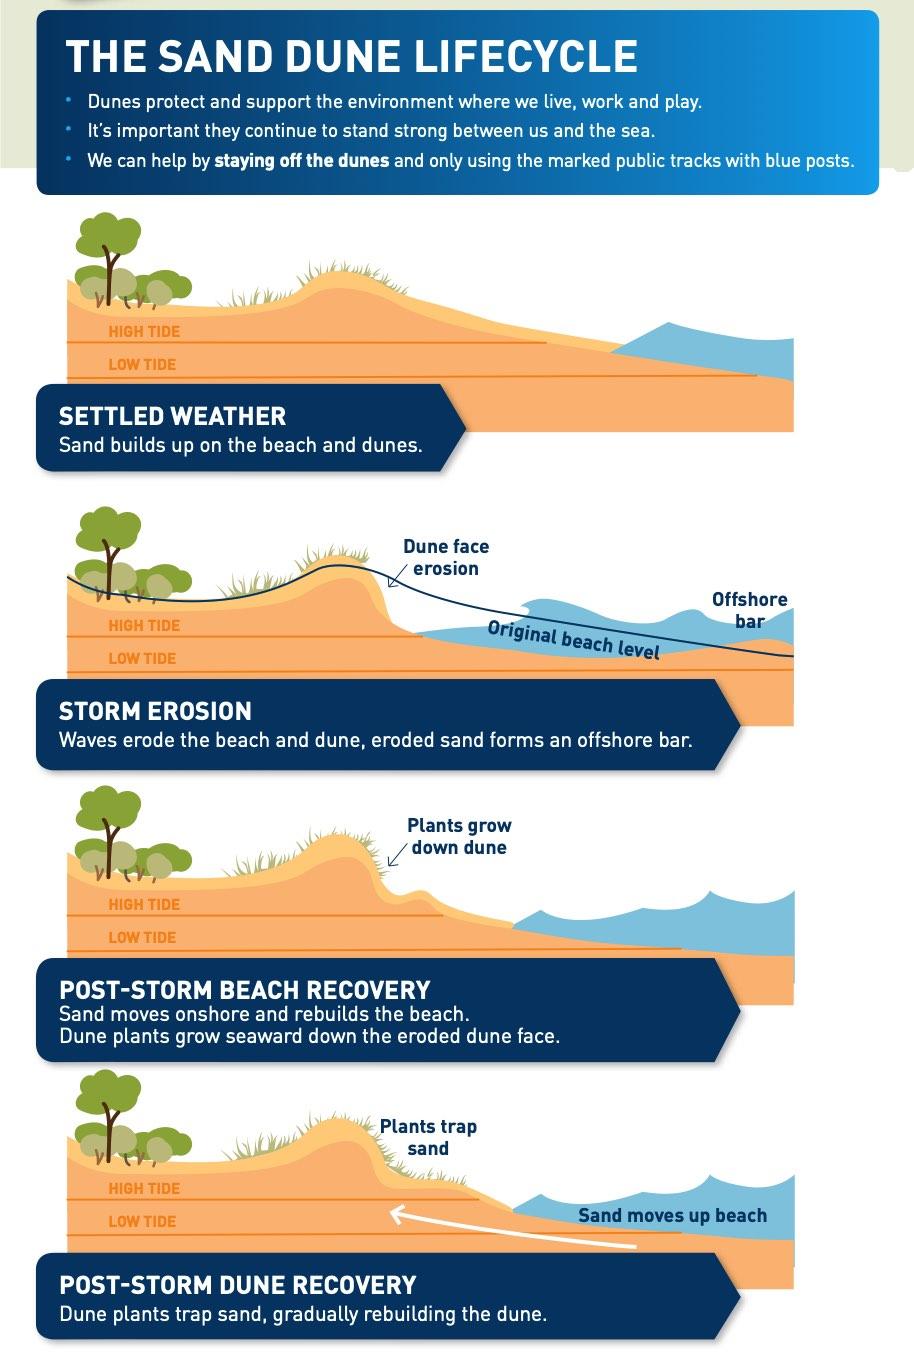 What do sand dunes do?